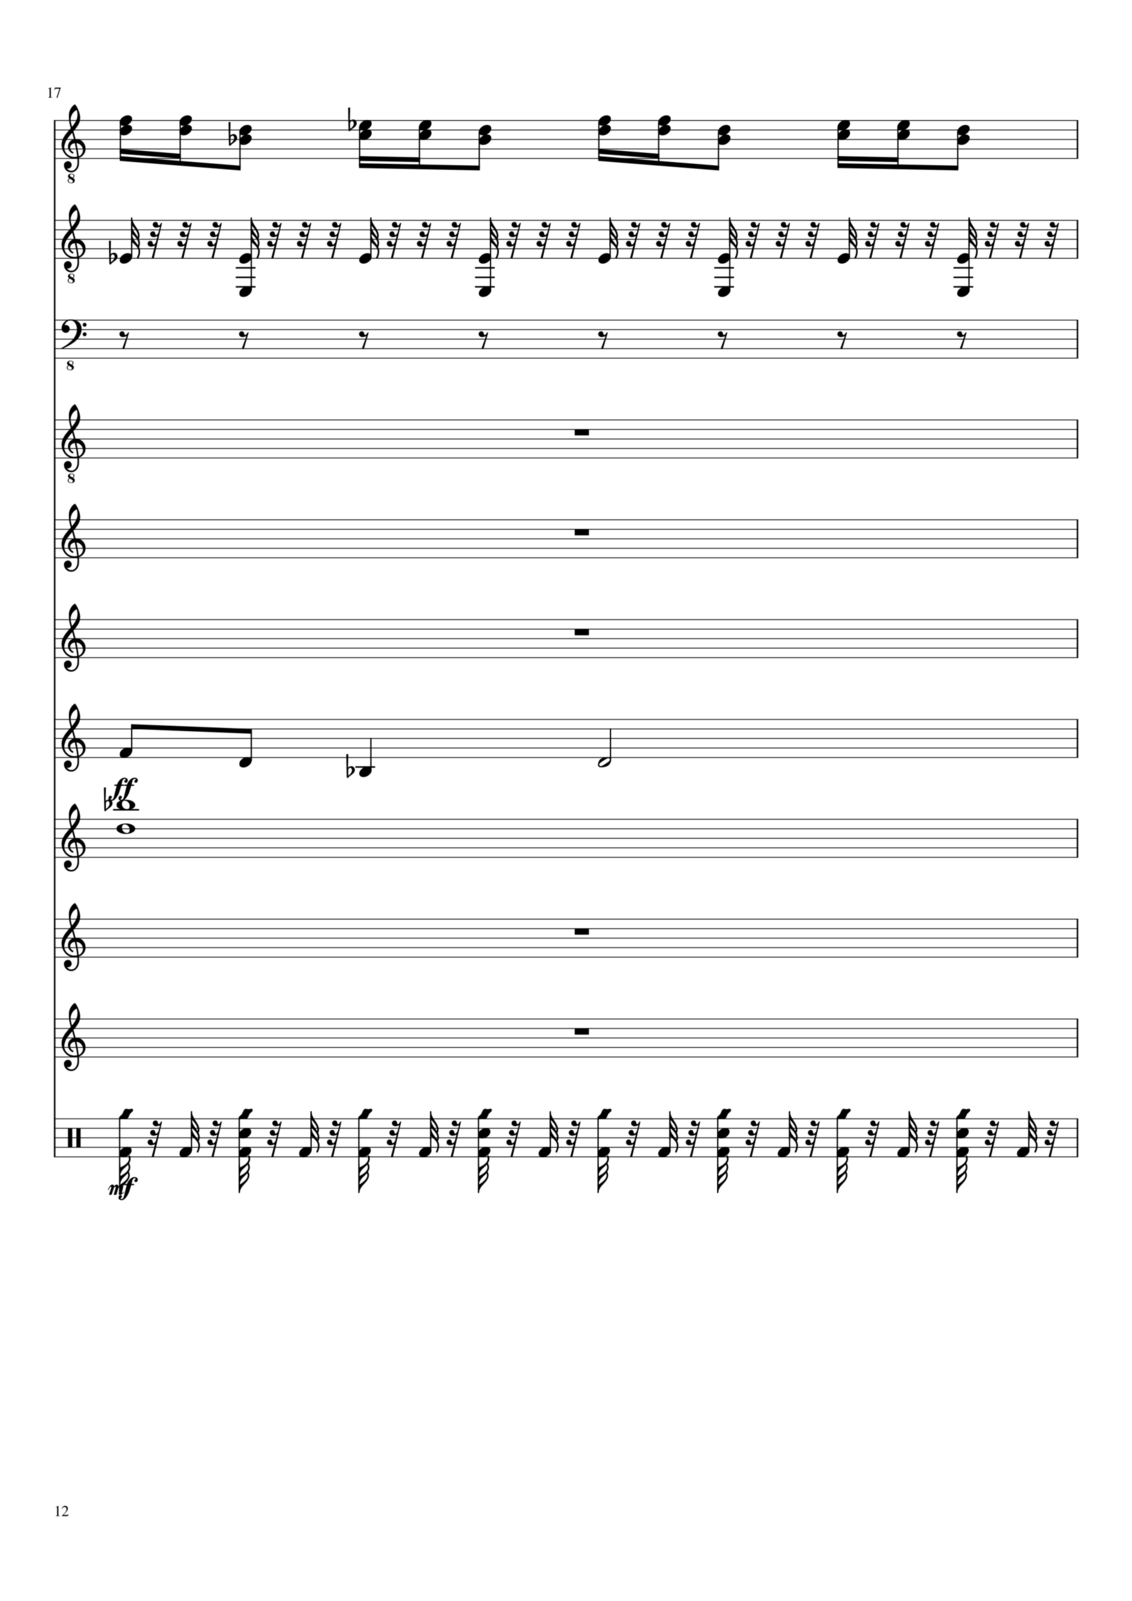 Belyiy sokol slide, Image 12